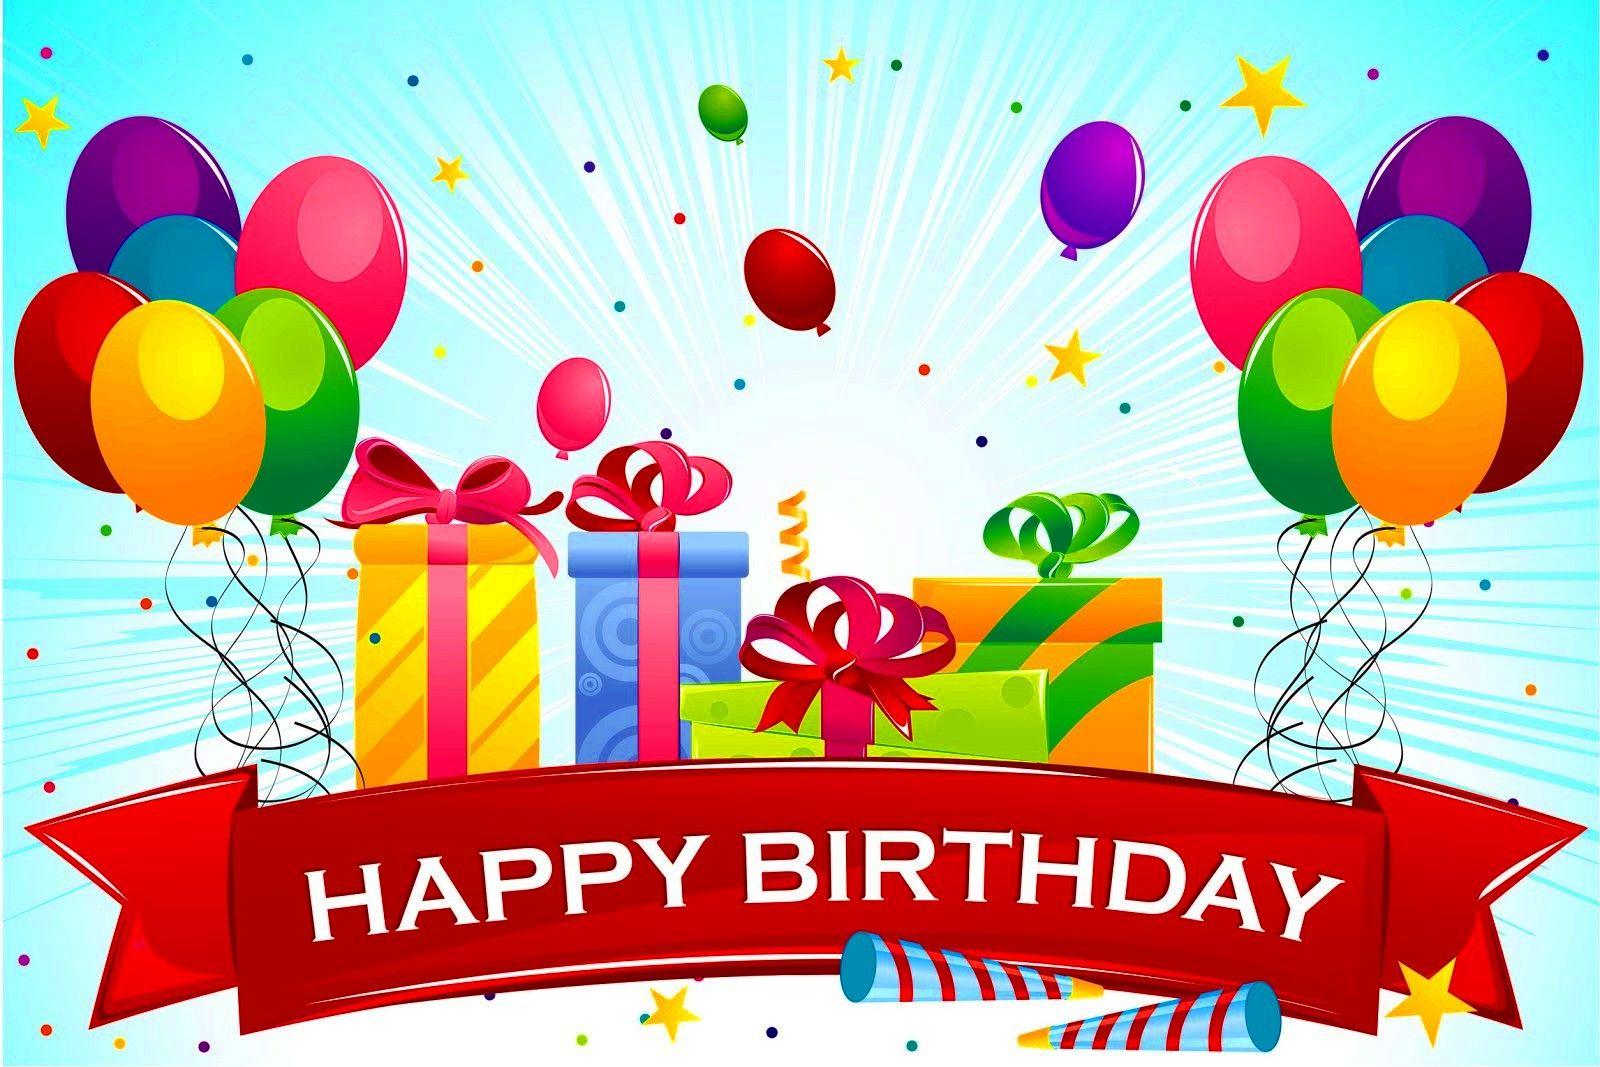 Happy birthday happy birthday wishes images happy